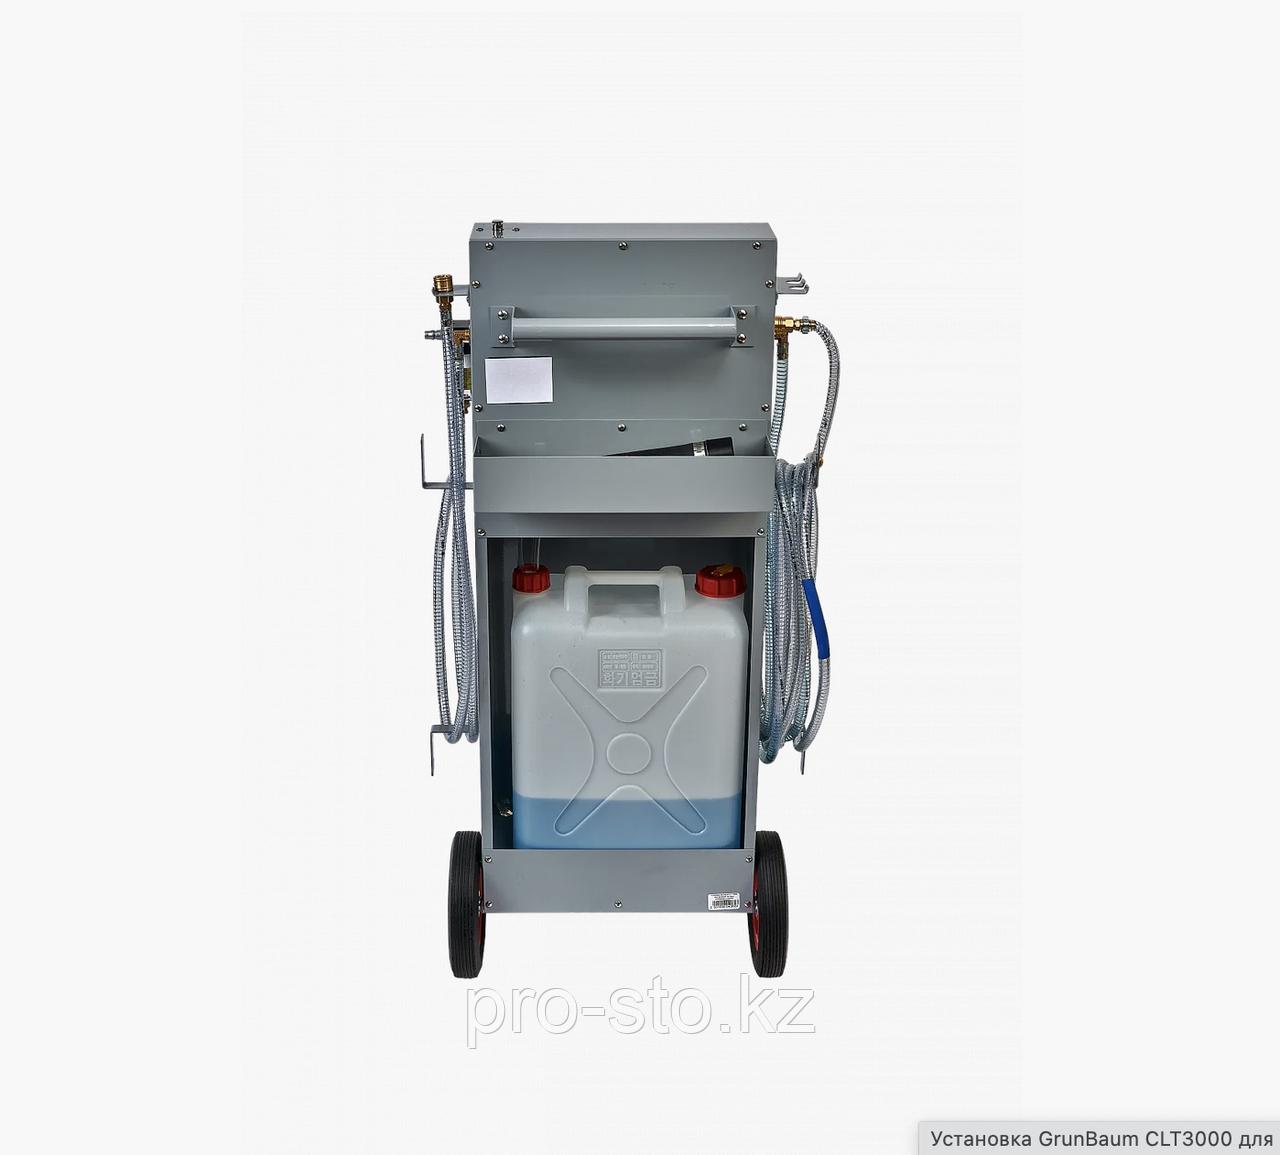 Установка для замены антифриза GrunBaum CLT3000 - фото 2